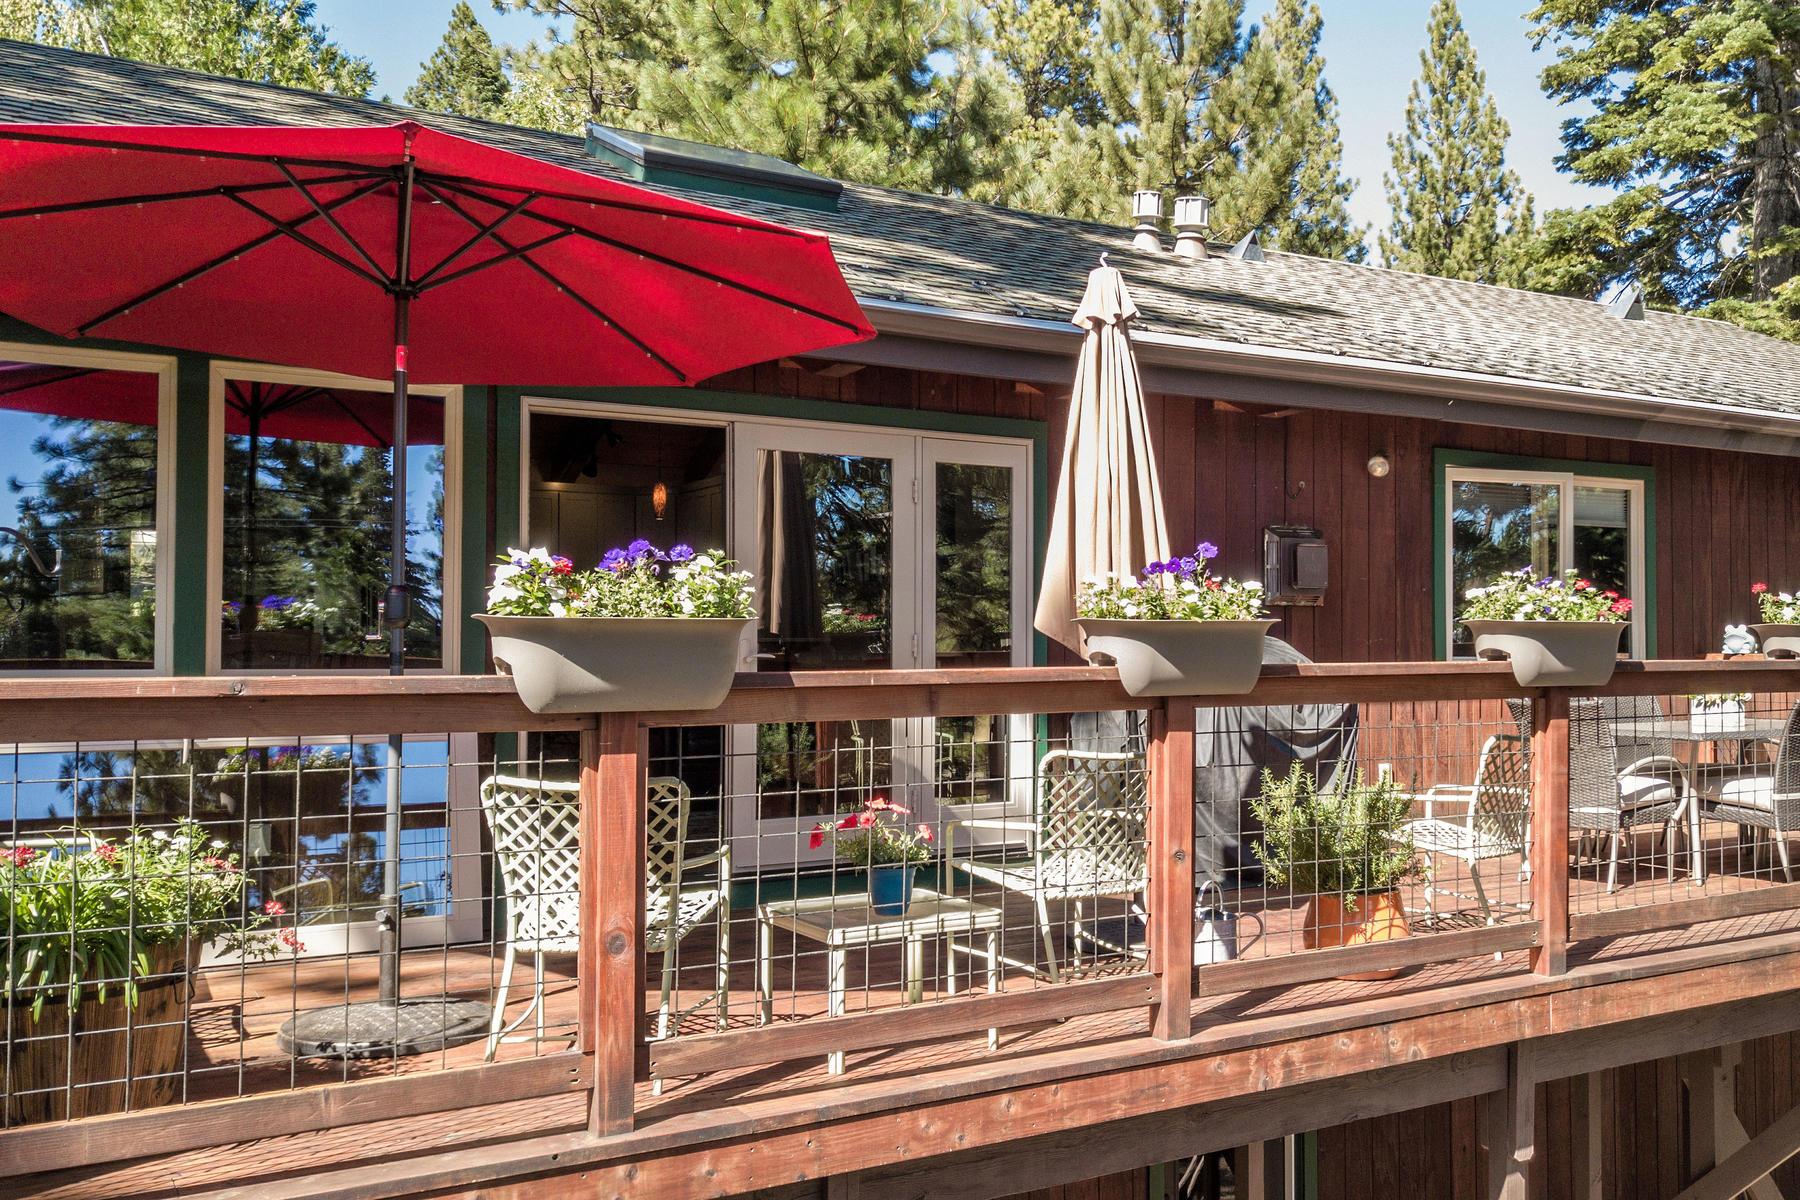 Additional photo for property listing at 3160 Polaris Rd, Tahoe City, CA 96145 3160 Polaris Rd Tahoe City, California 96145 Estados Unidos